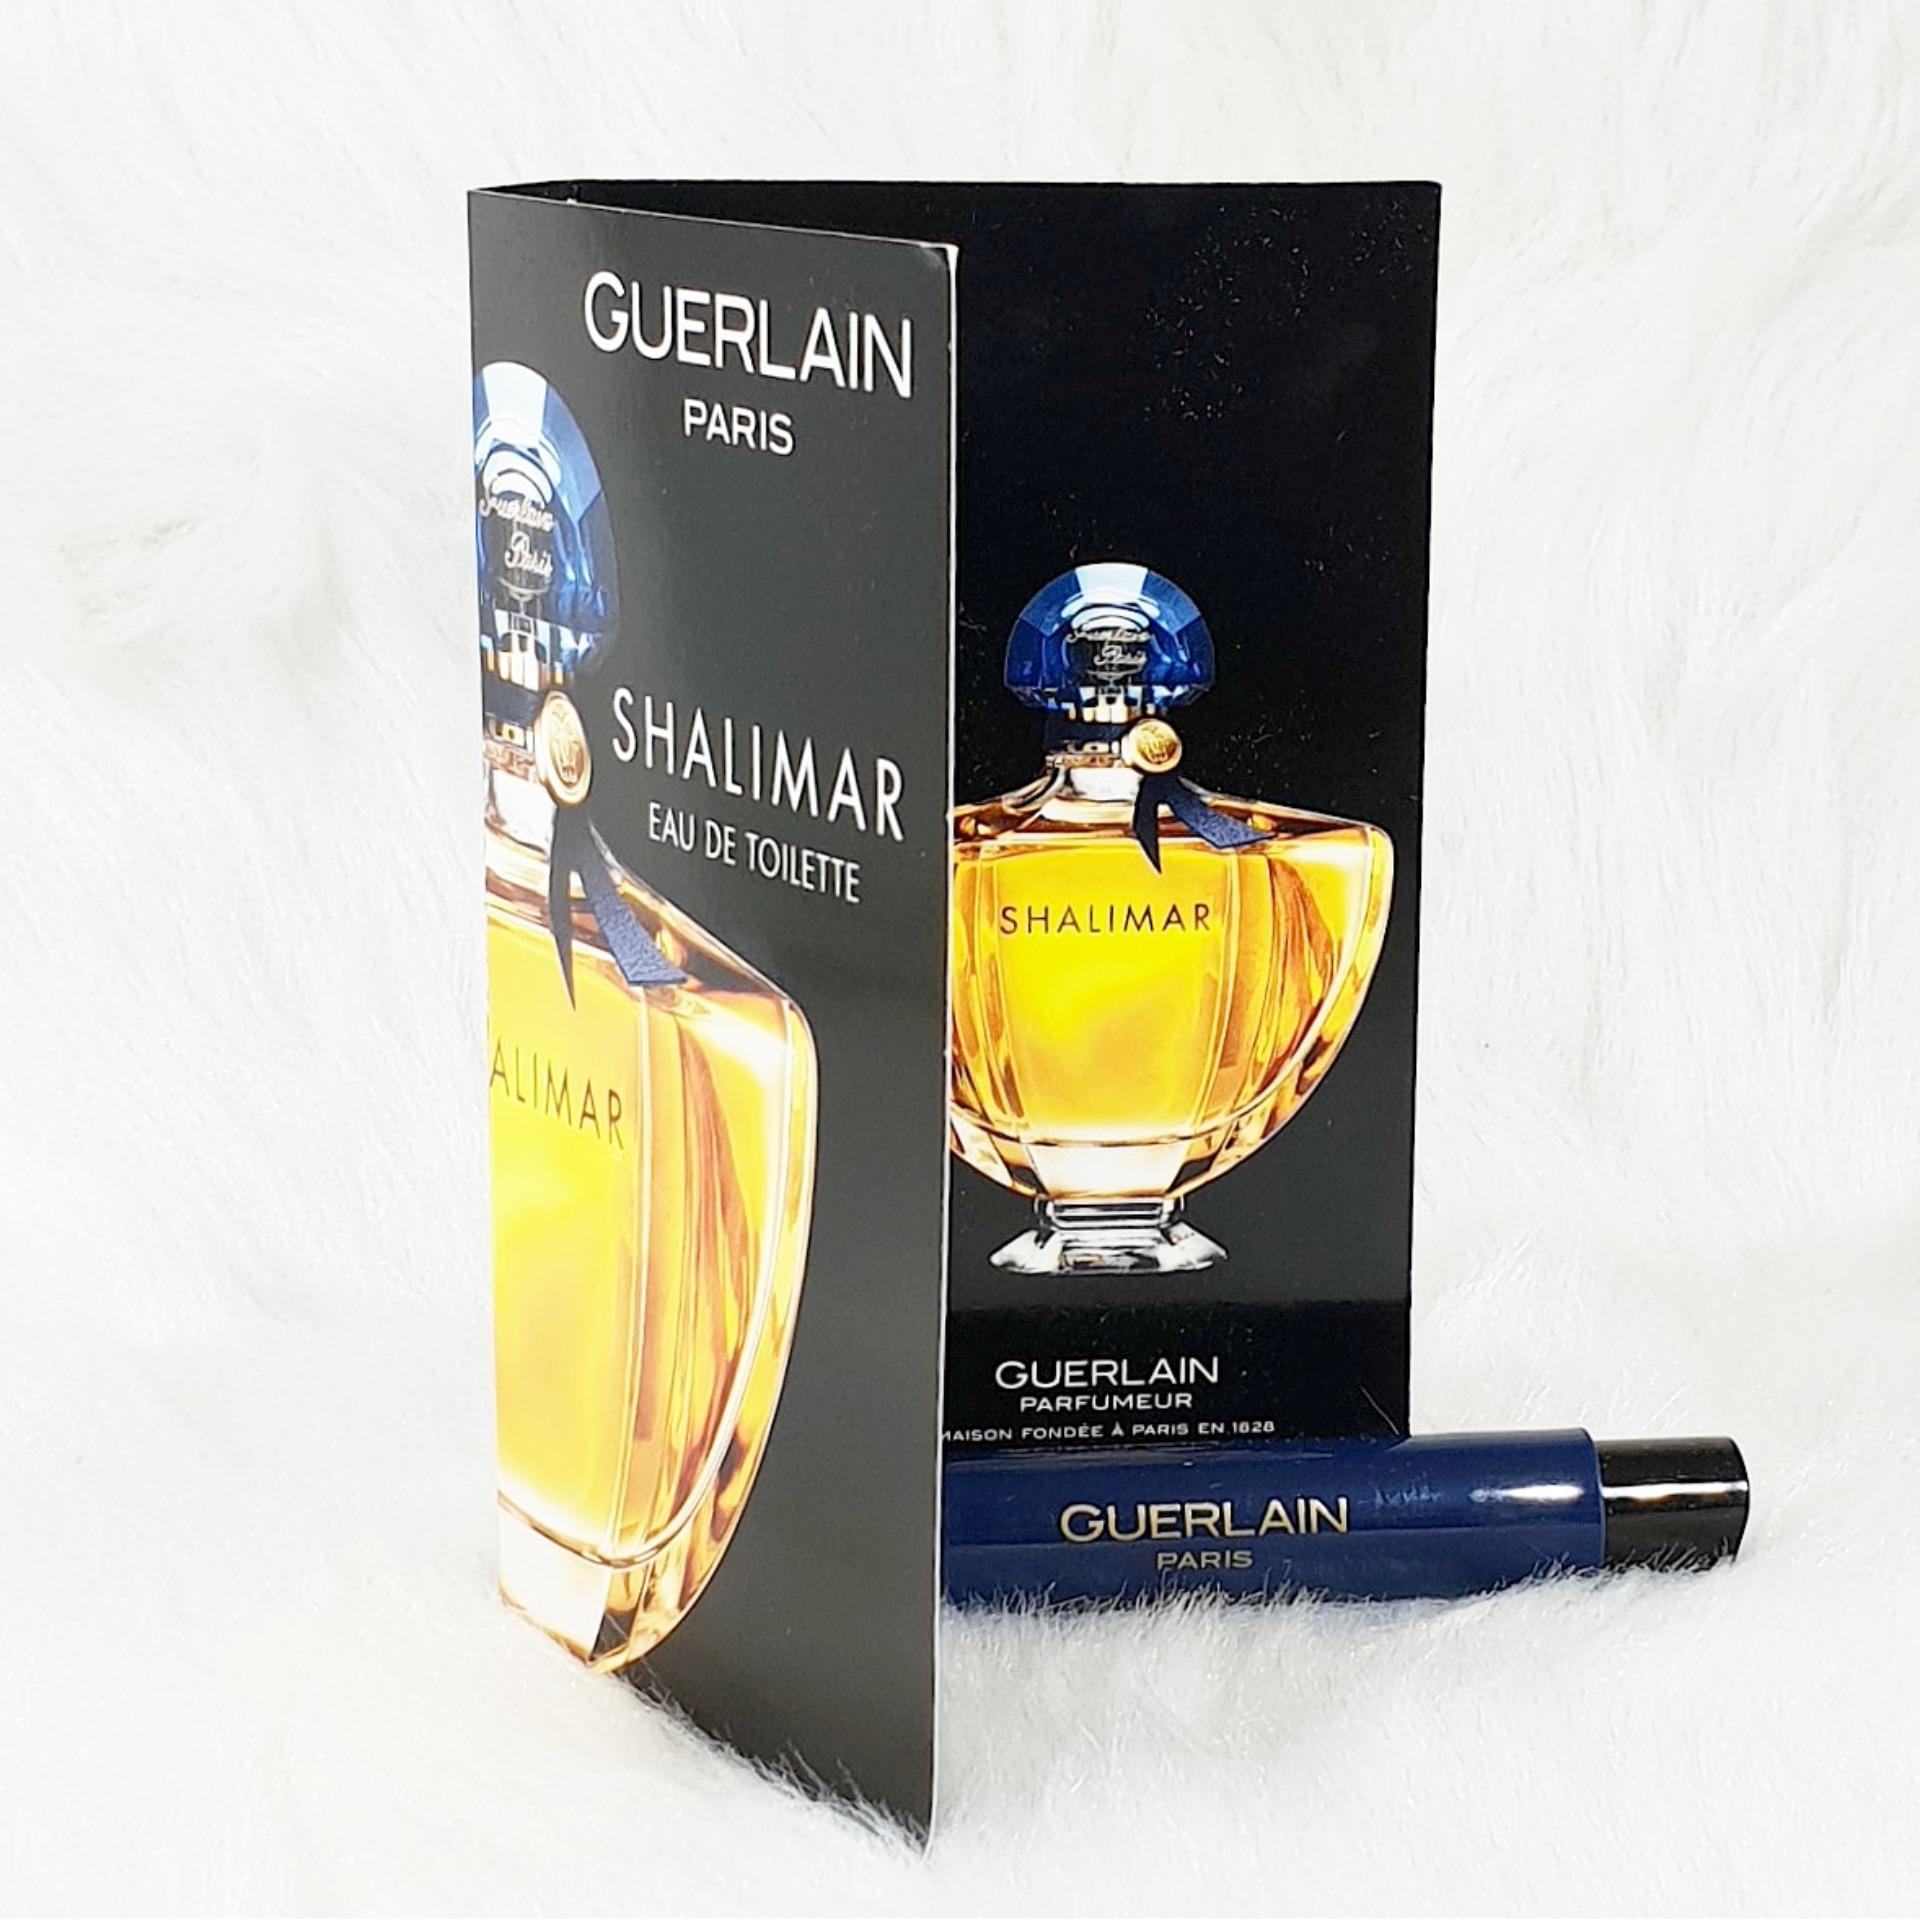 Guerlain Philippines Price List Lipstick Eye Shadow Shalimar Eau De Parfum 90ml Toilette Perfume Vial